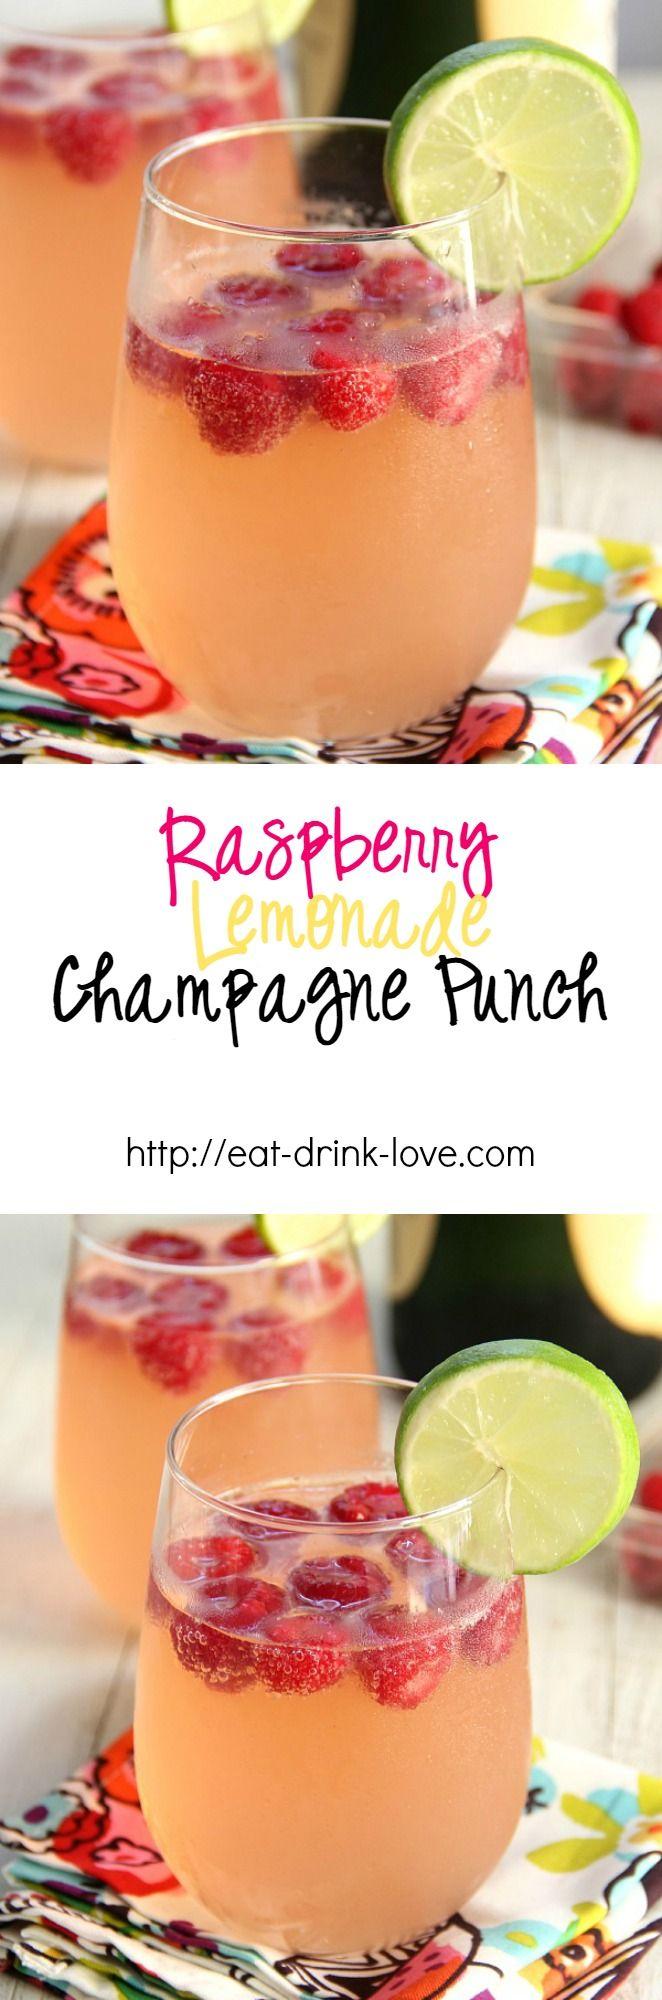 Raspberry Lemonade Champagne Punch - Eat. Drink. Love.